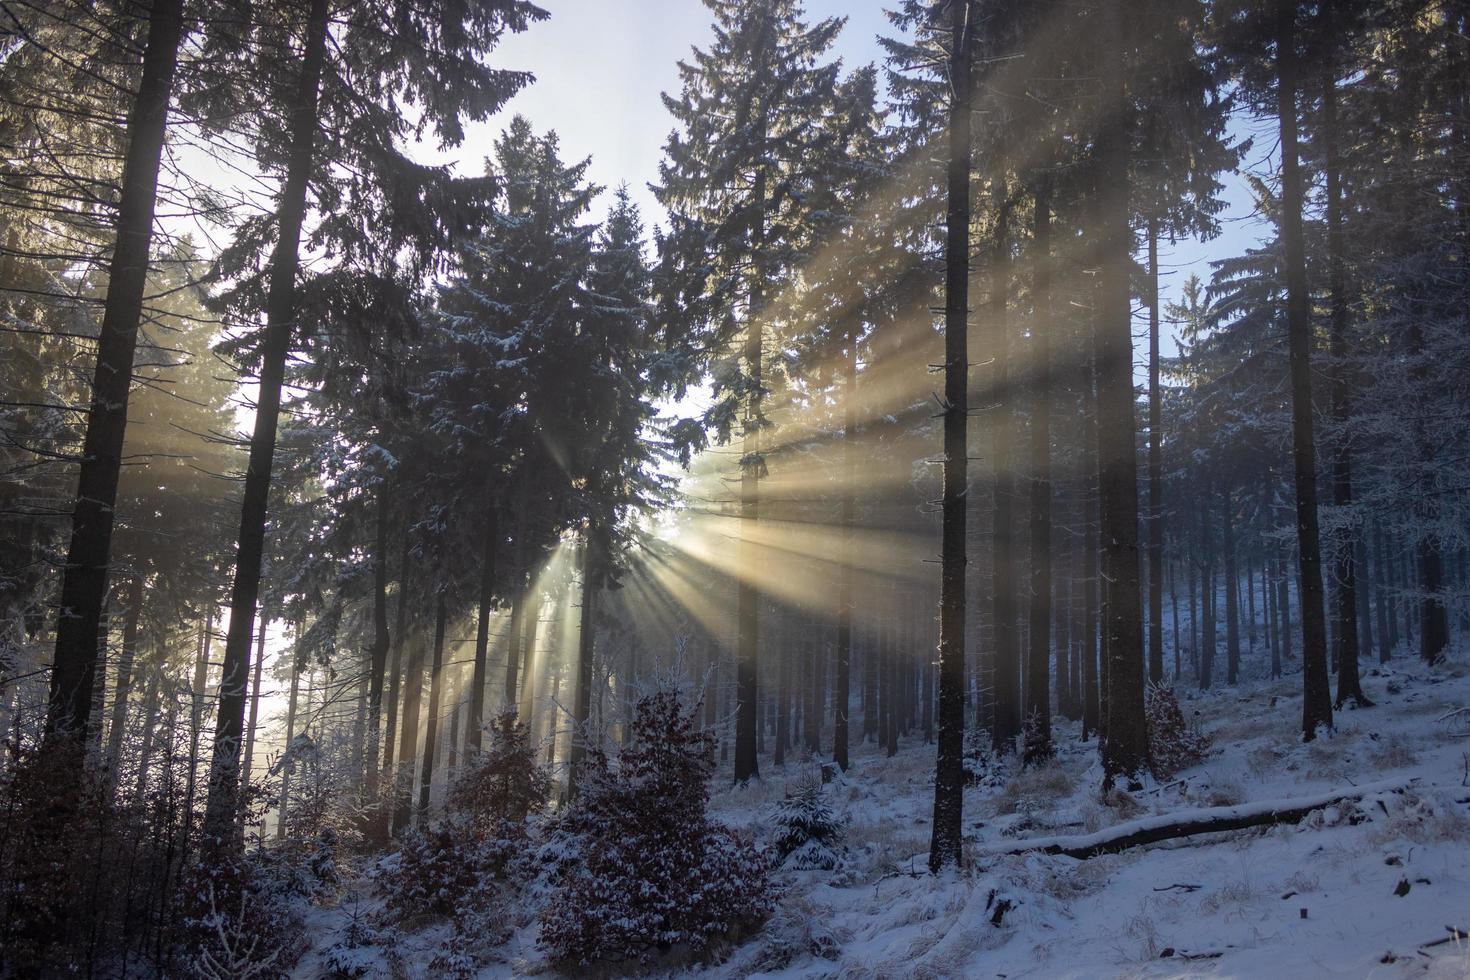 Sunshine through snowy landscape photo